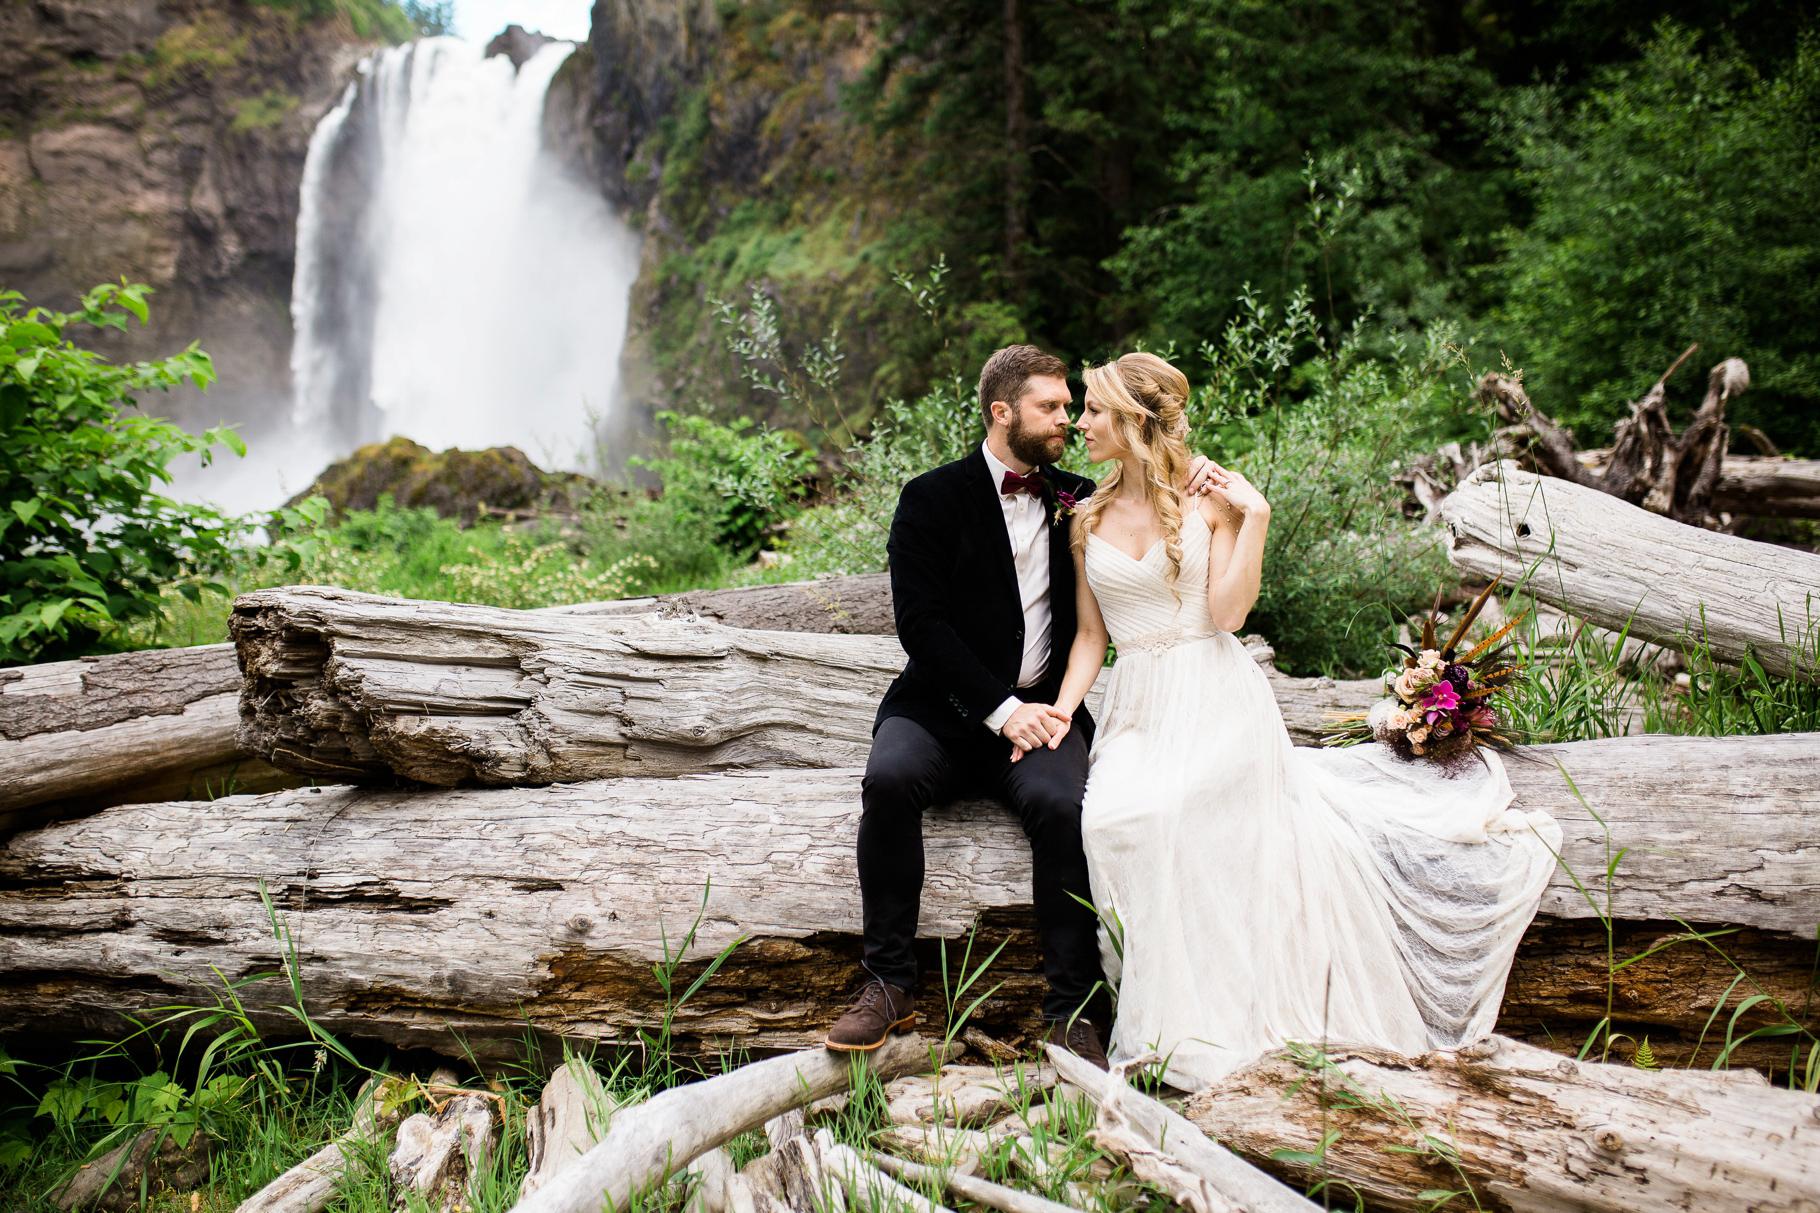 17-Adventure-Elopement-Waterfall-Seattle-Wedding-Photographer-Snoqualmie-Falls-Hike